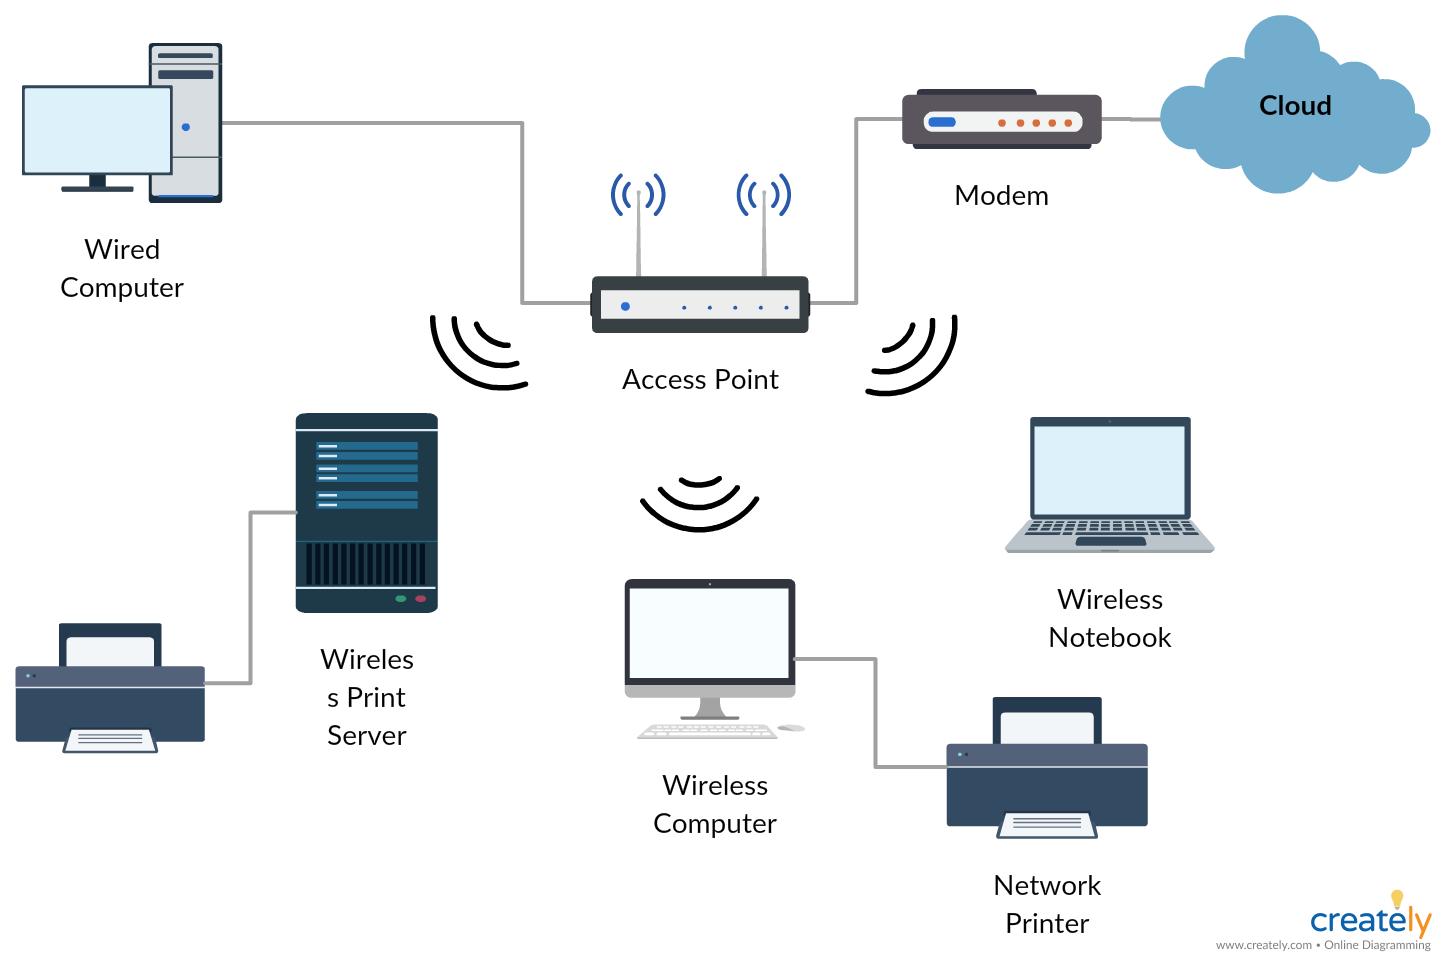 wireless network diagram wiring diagram wireless network wiring diagram [ 1445 x 961 Pixel ]